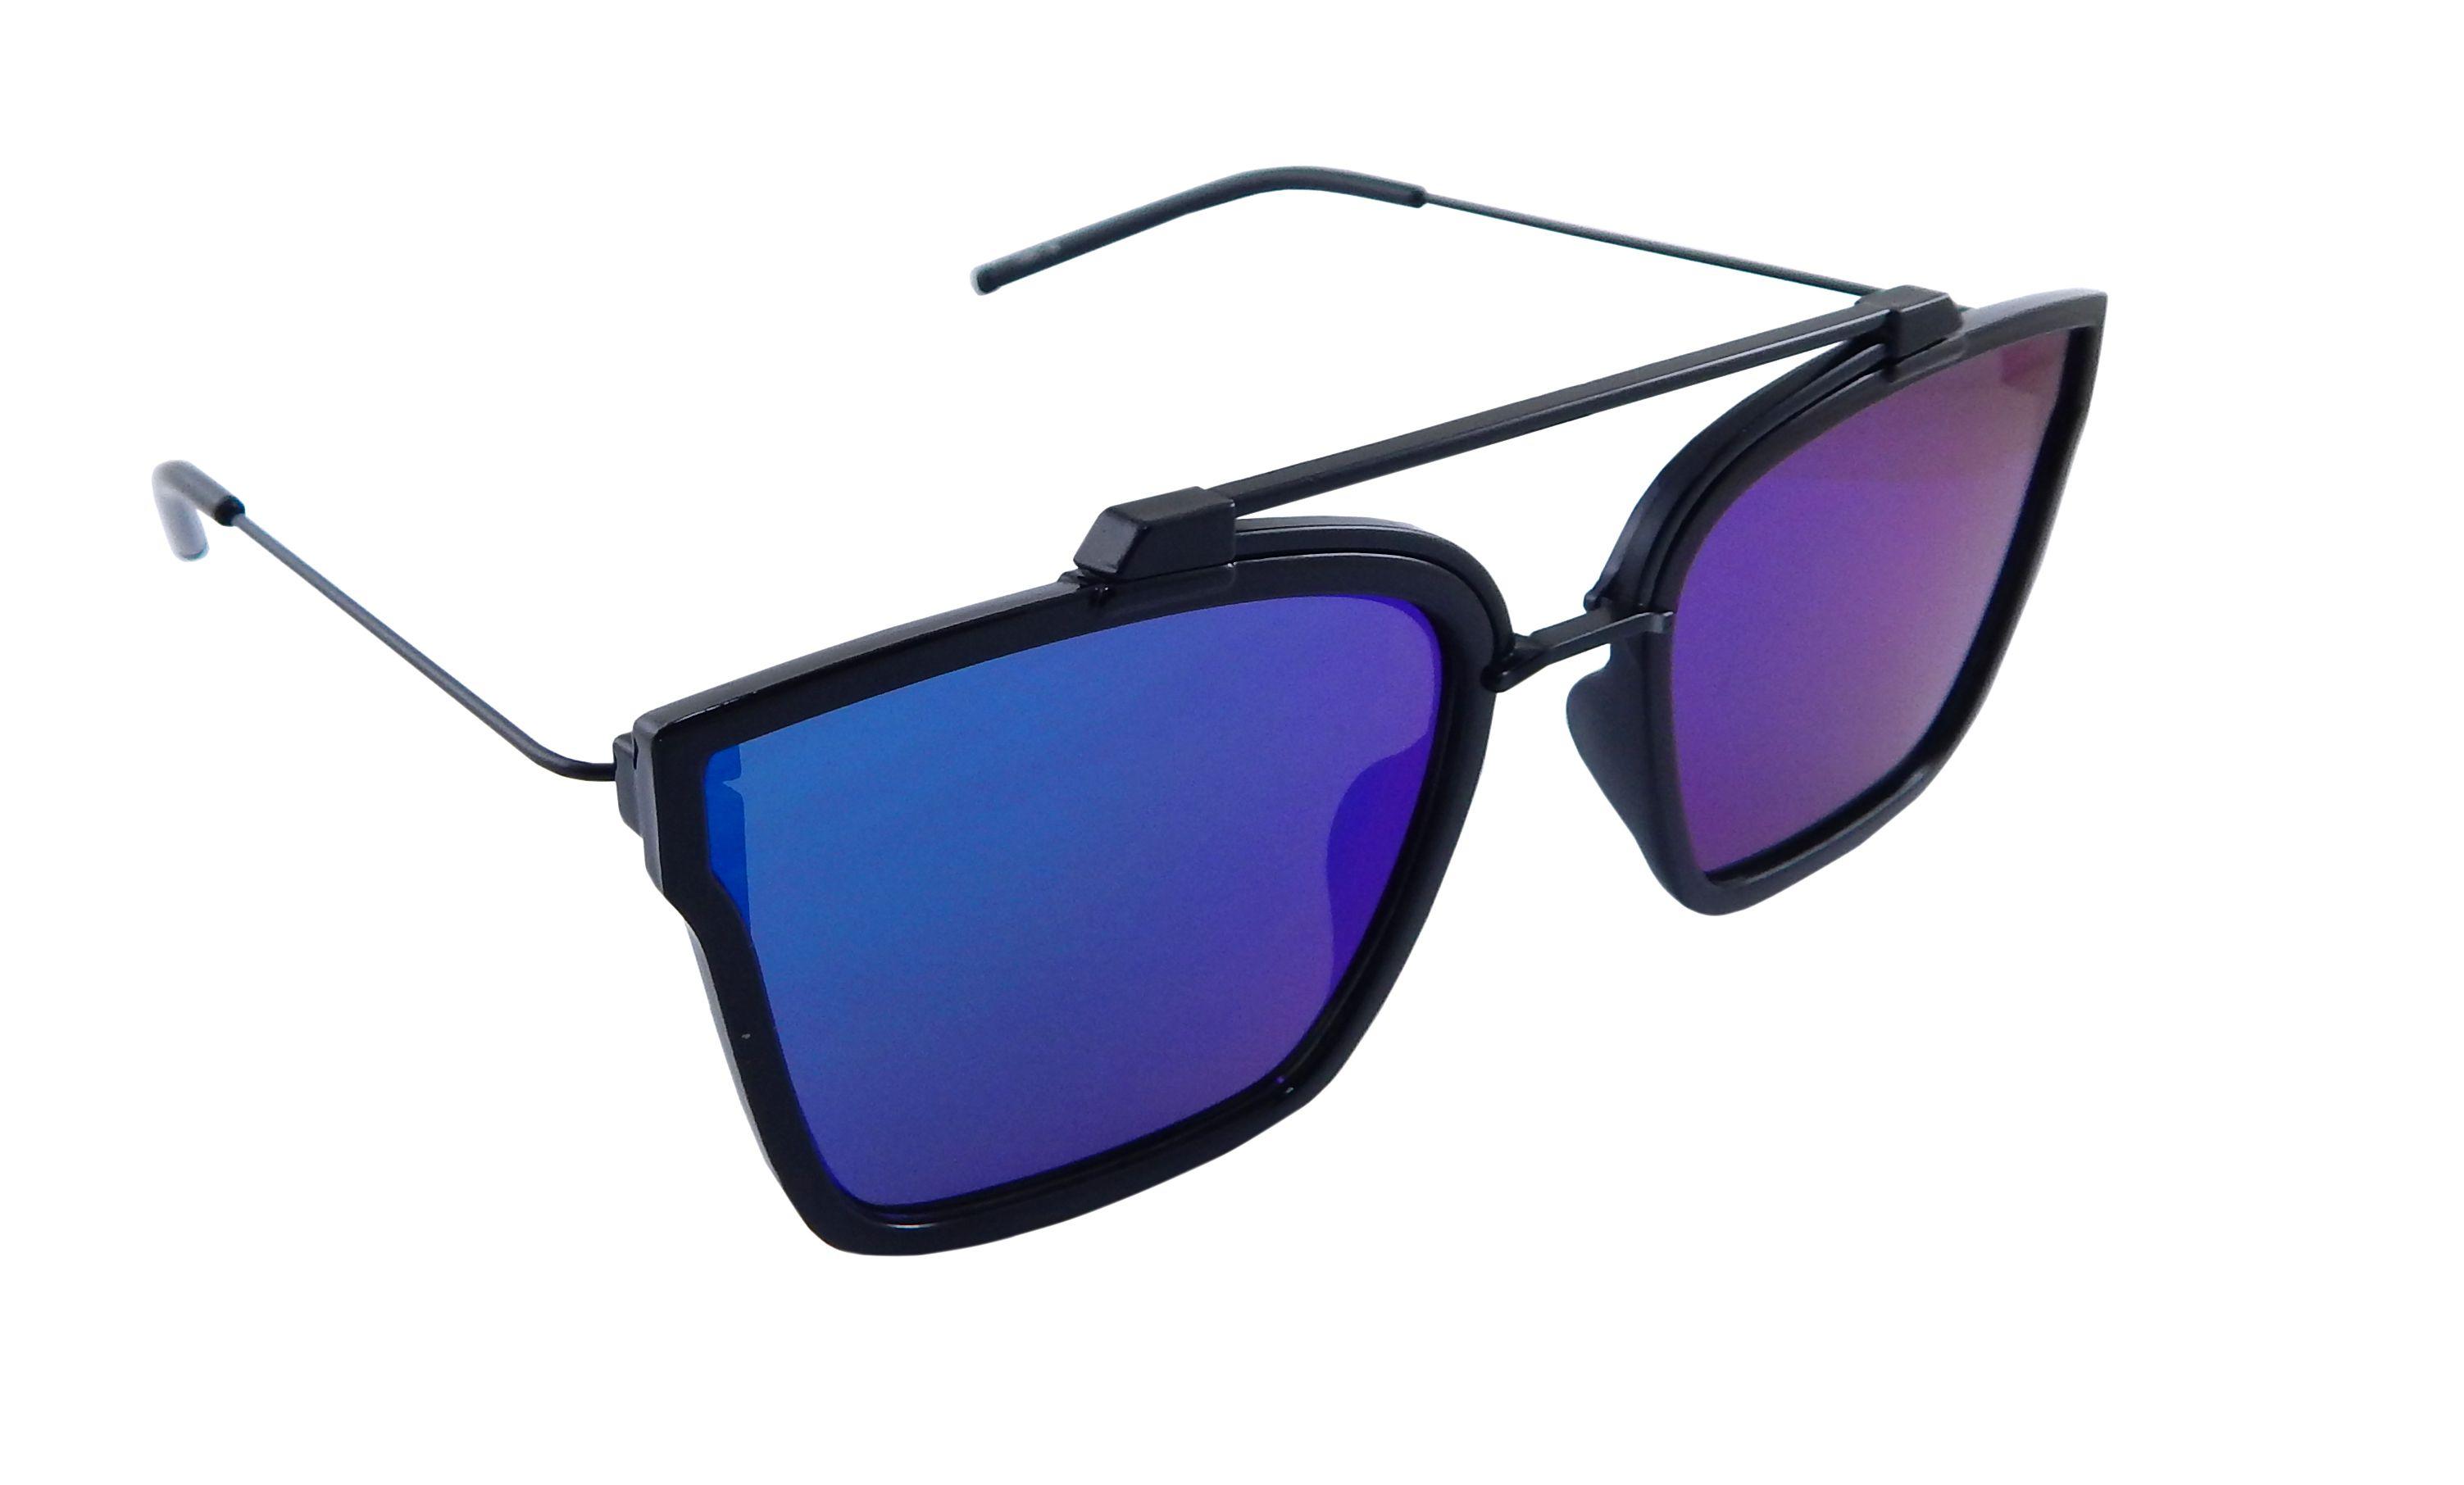 Els Multicolor Rectangle Sunglasses ( 53841-54-BLK-GRNBU-MR-S )